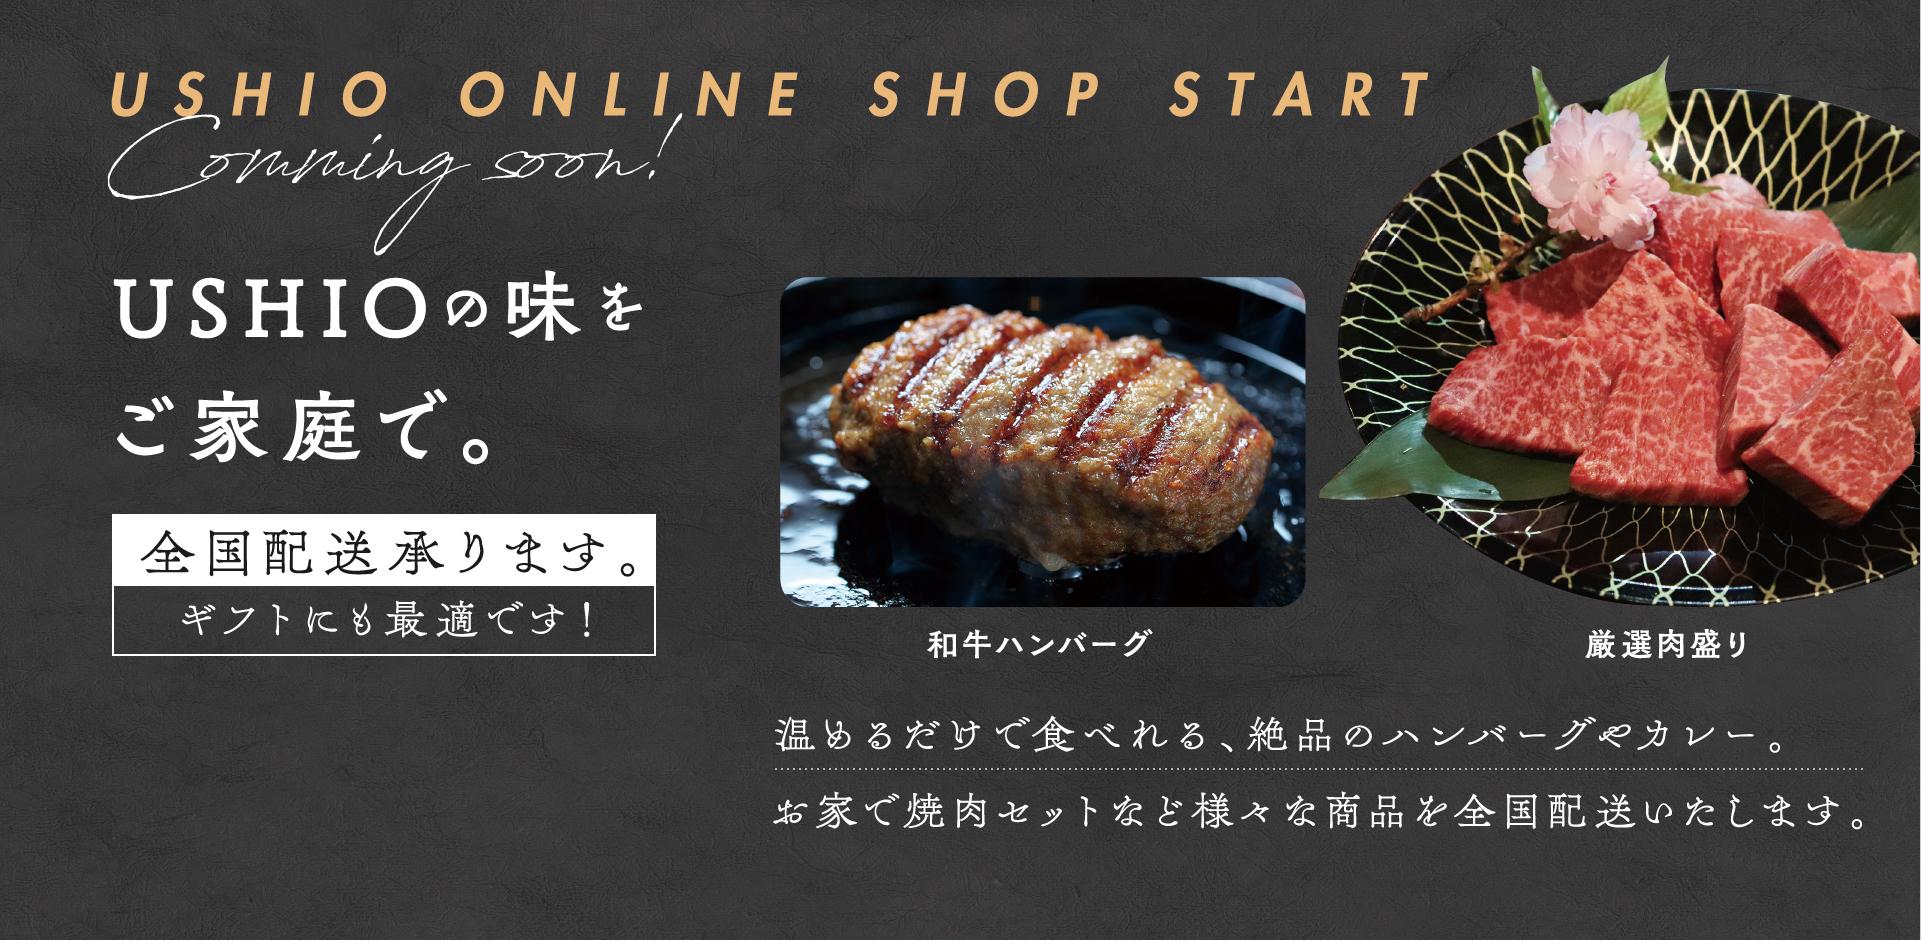 USHIOの味をご家庭で。全国配送承ります。